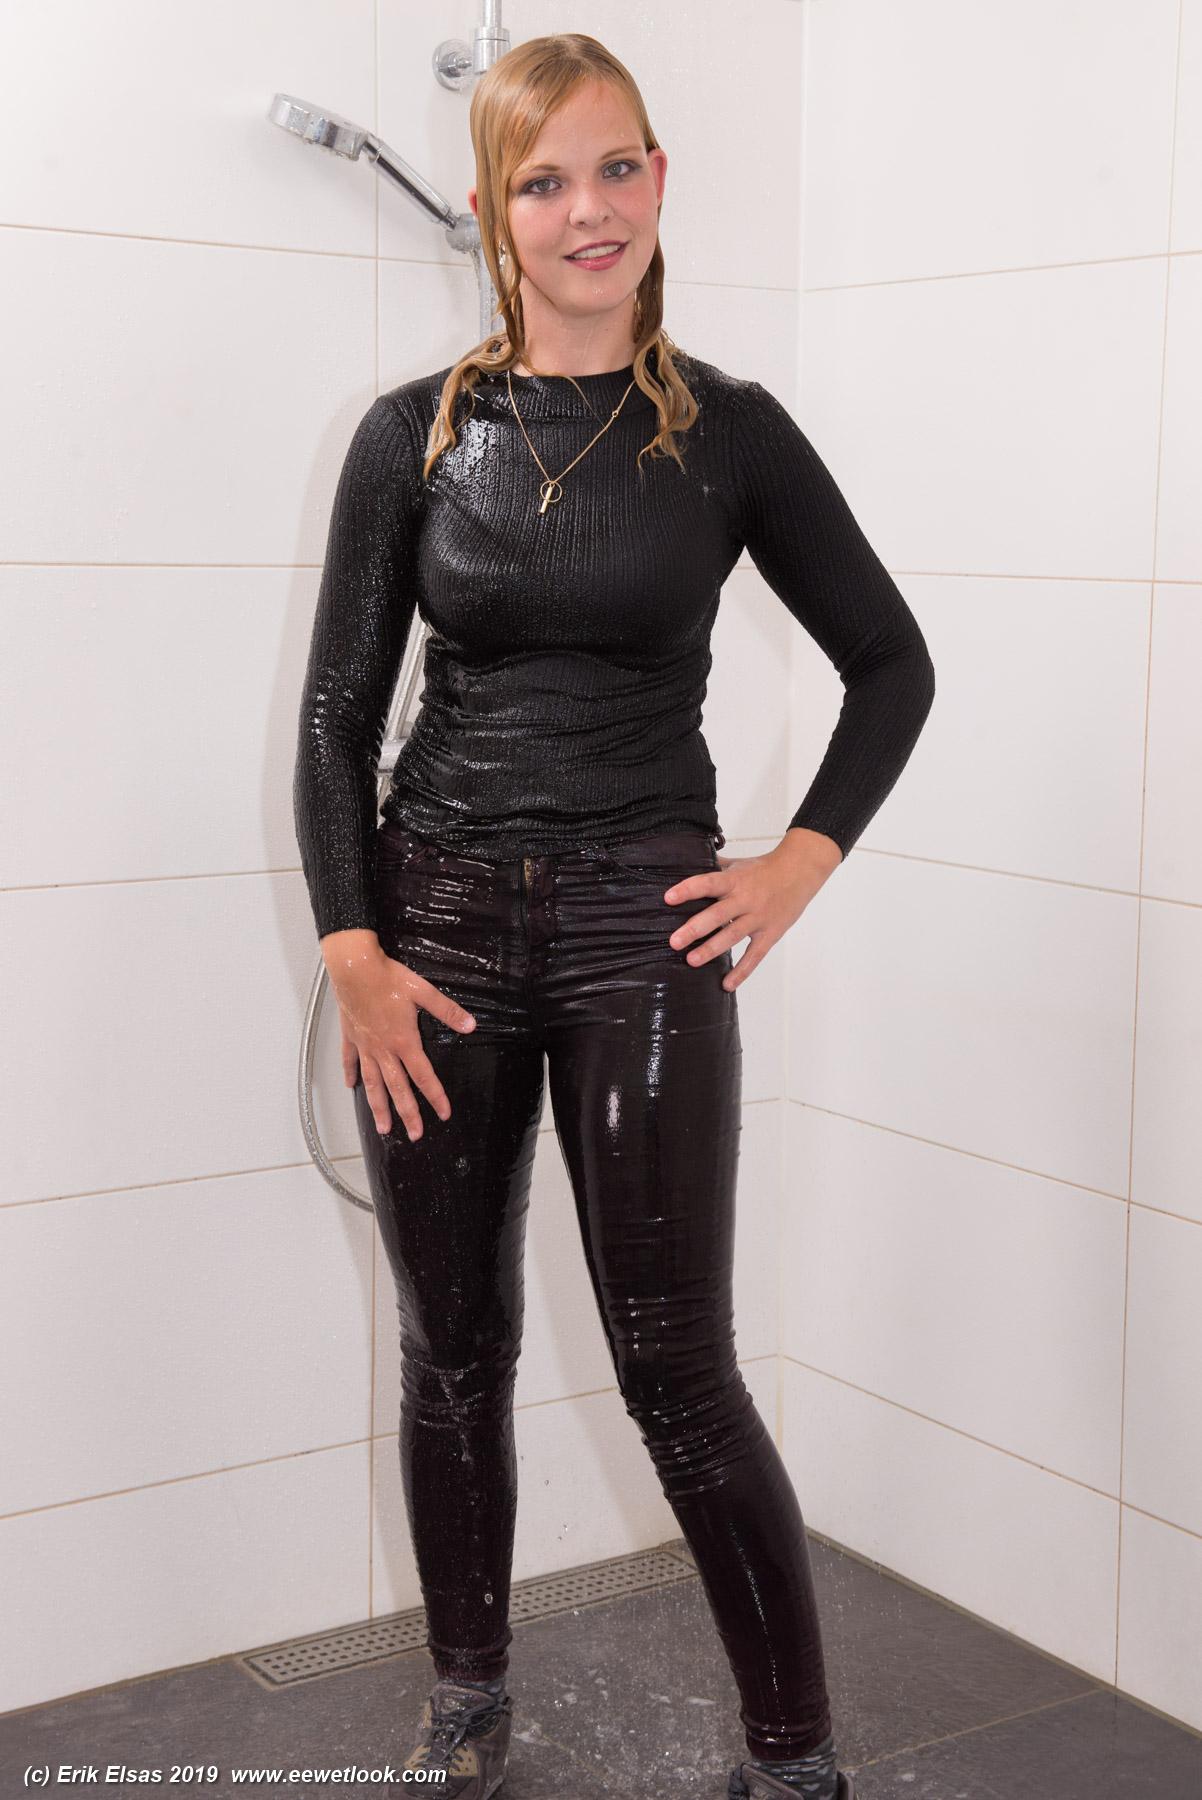 Ranrann Sexy Women's Pvc Leather Wet Look Open Crotch Butt Skinny Long Legging Trousers Hot Pants